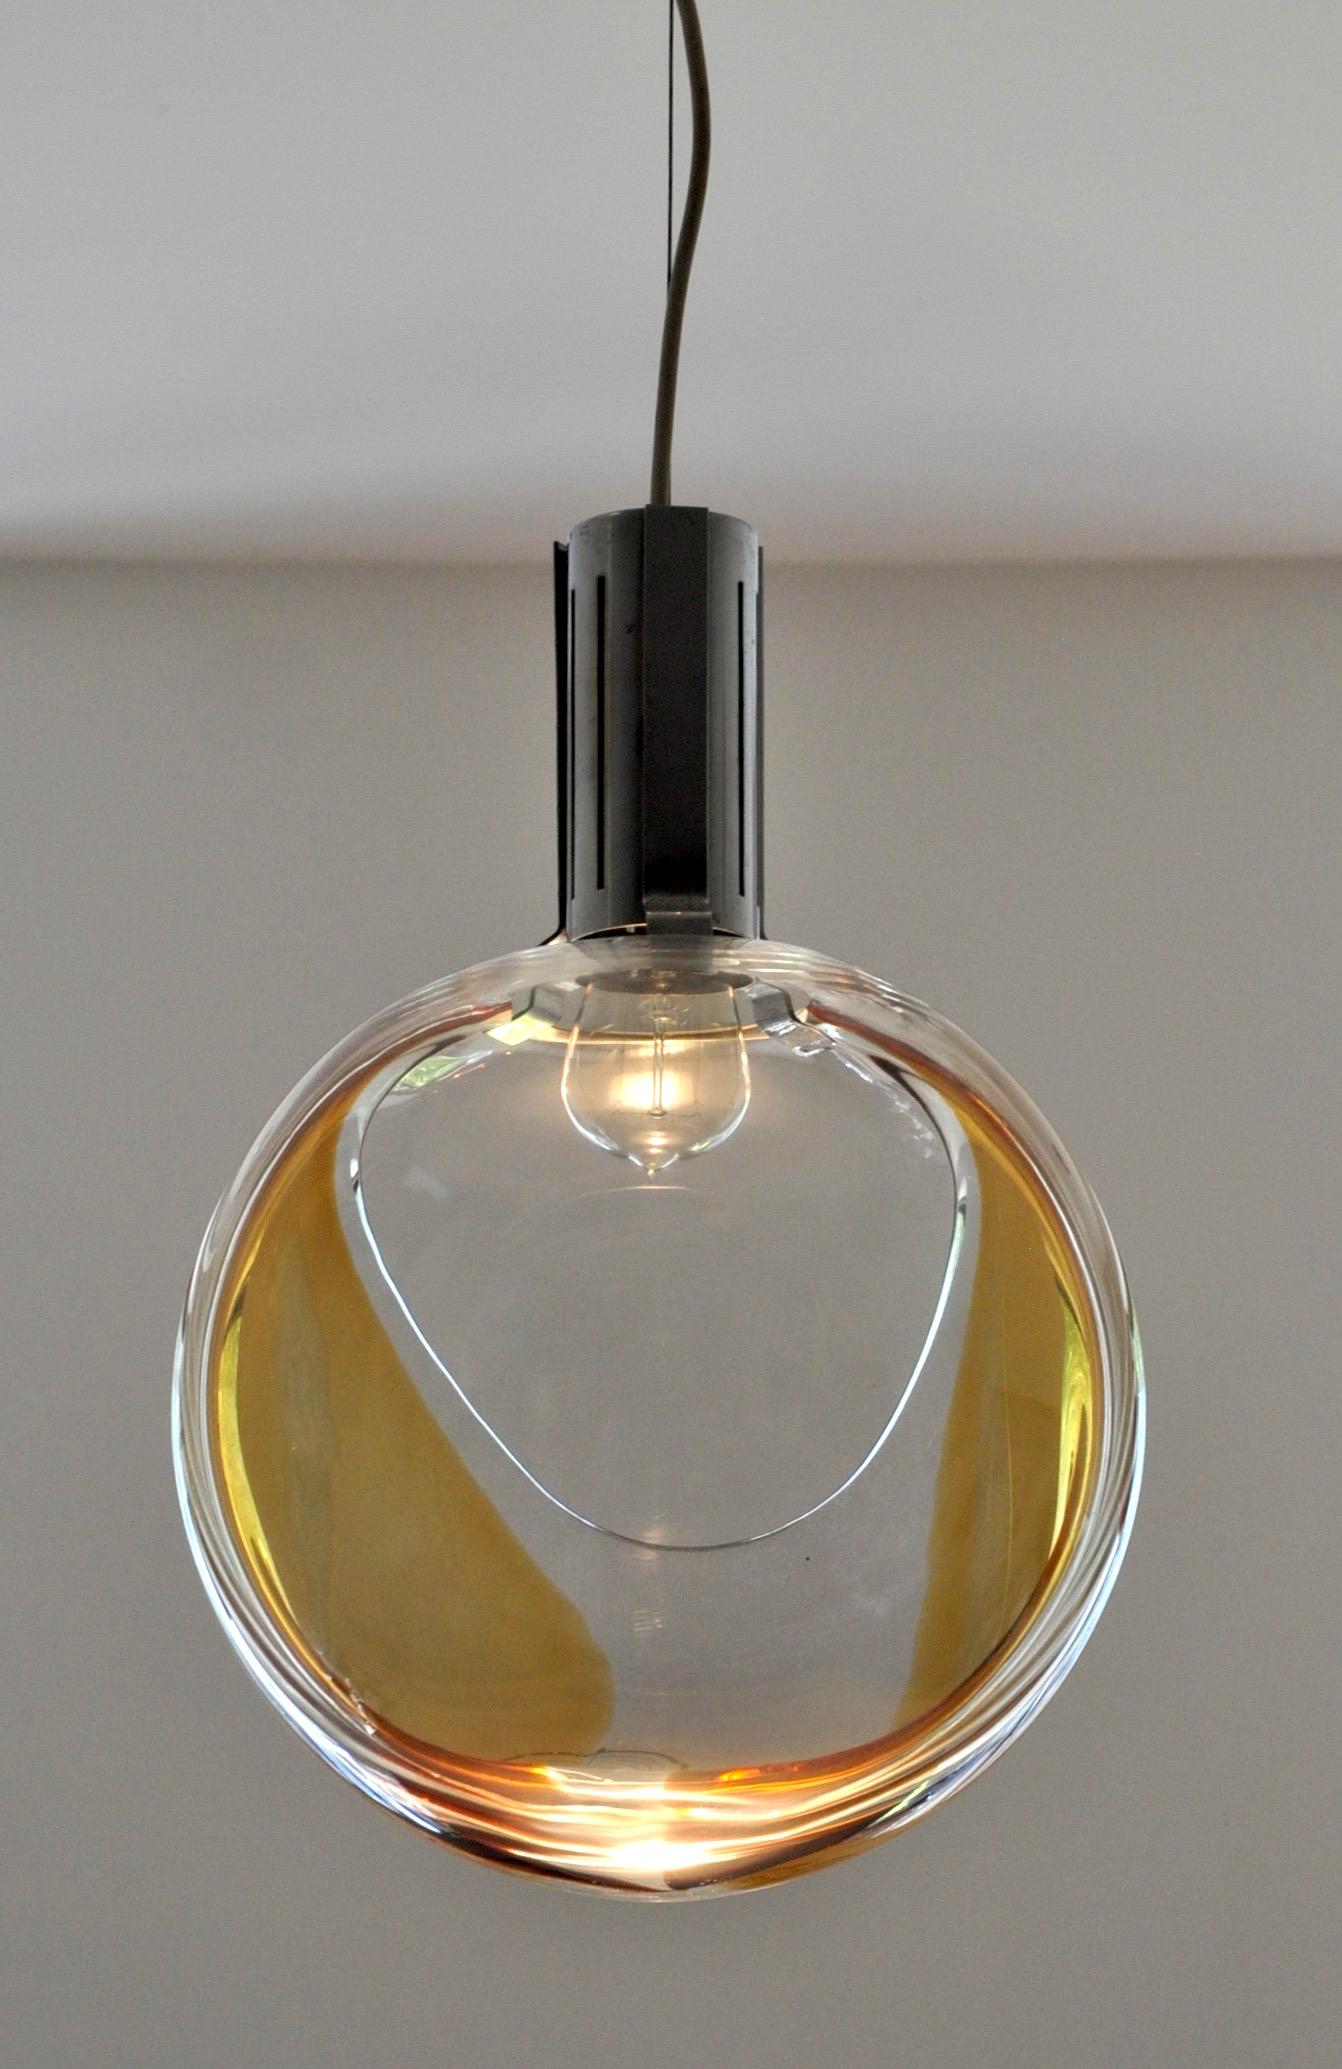 Toni Zuccheri pendant lamps, Italy, 1970s Image